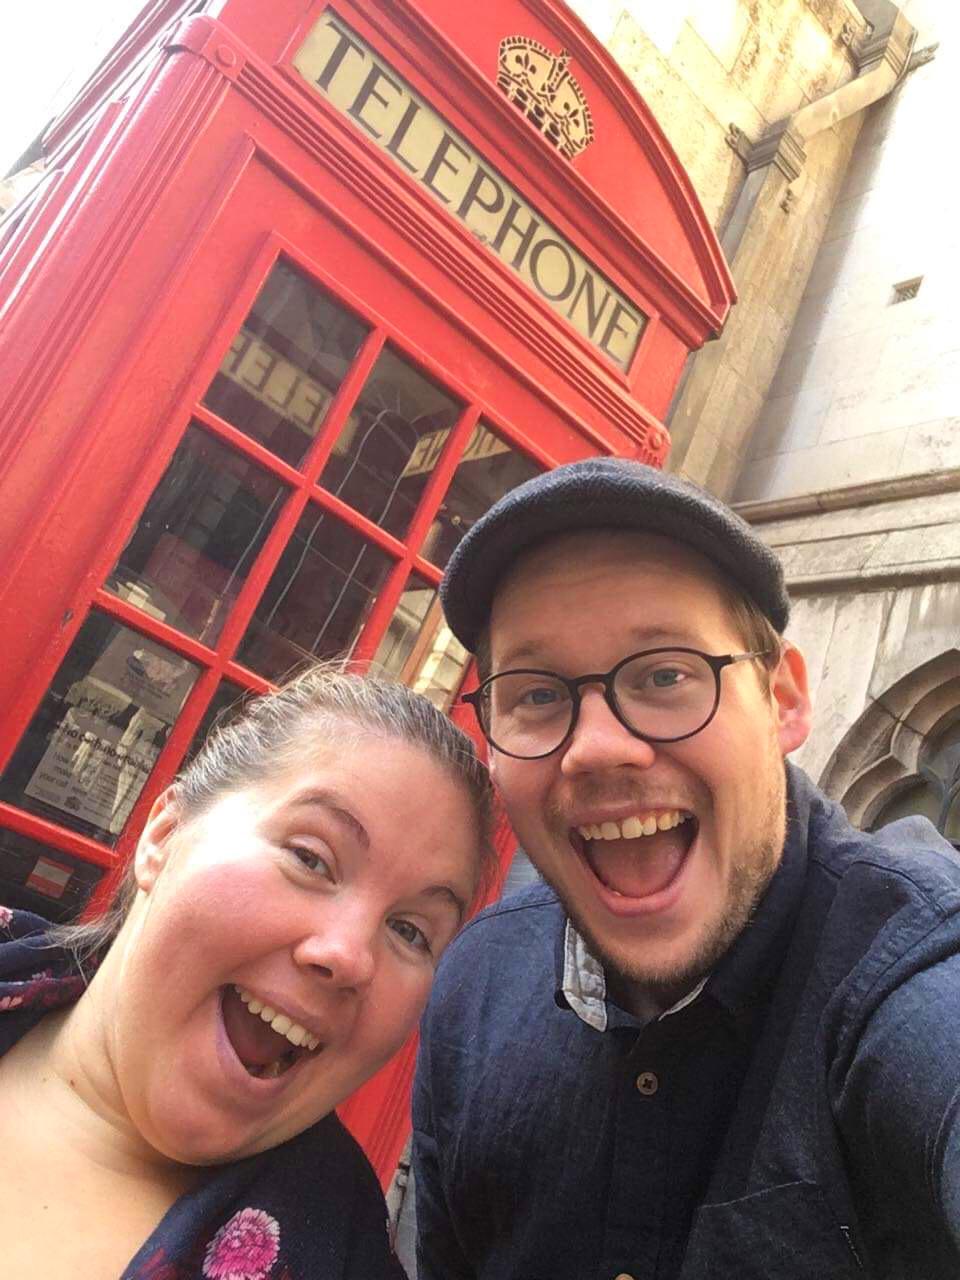 Lena og Bent tar selfie foran en rød telefonboks.